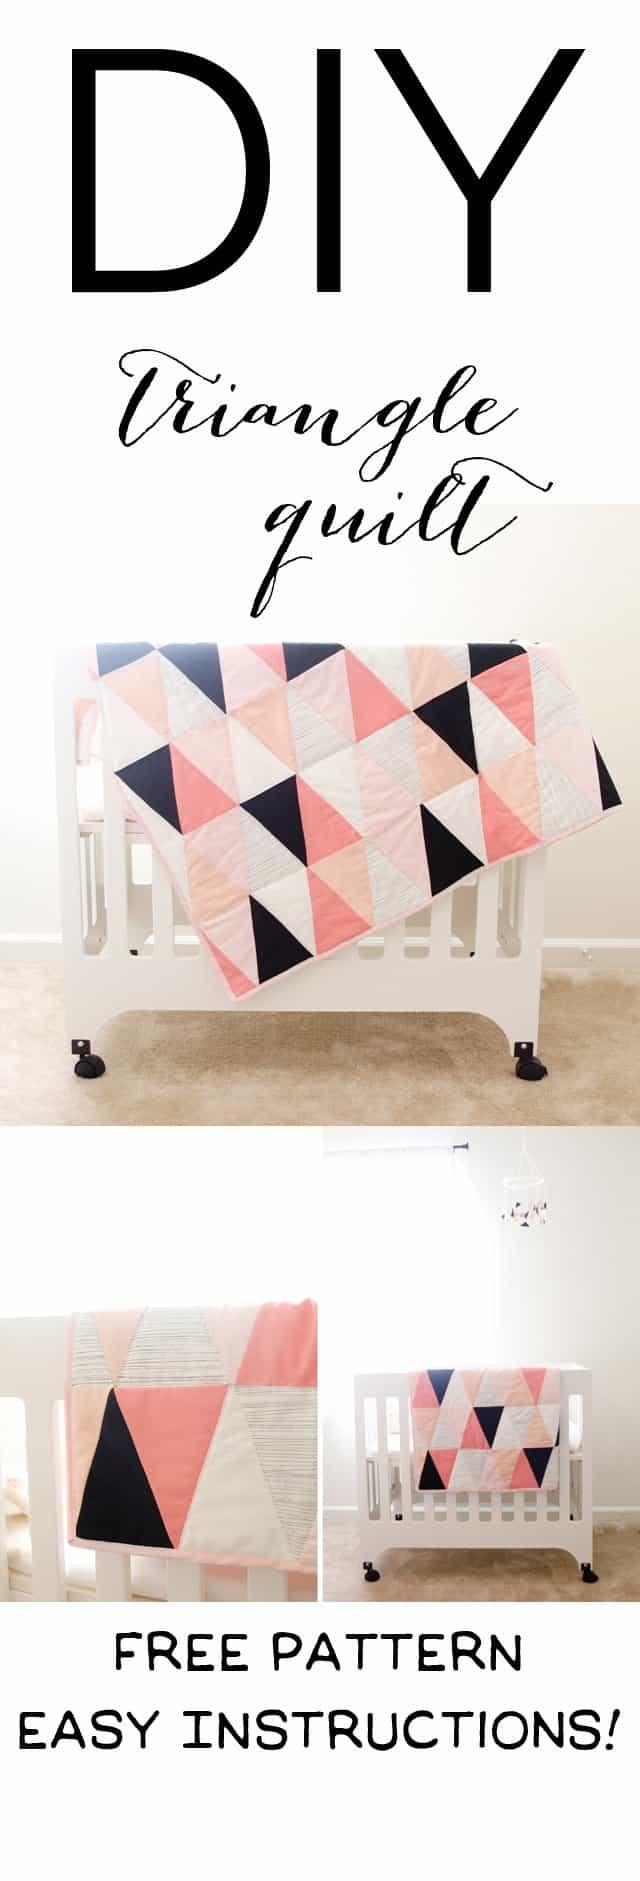 modern ombre + b/w triangle quilt tutorial + pattern | how to make a triangle quilt | handmade quilt | free quilt tutorial | baby quilt tutorial | baby quilt patterns || see kate sew #babyquilt #sewingtutorial #diyquilt #handmadequilts